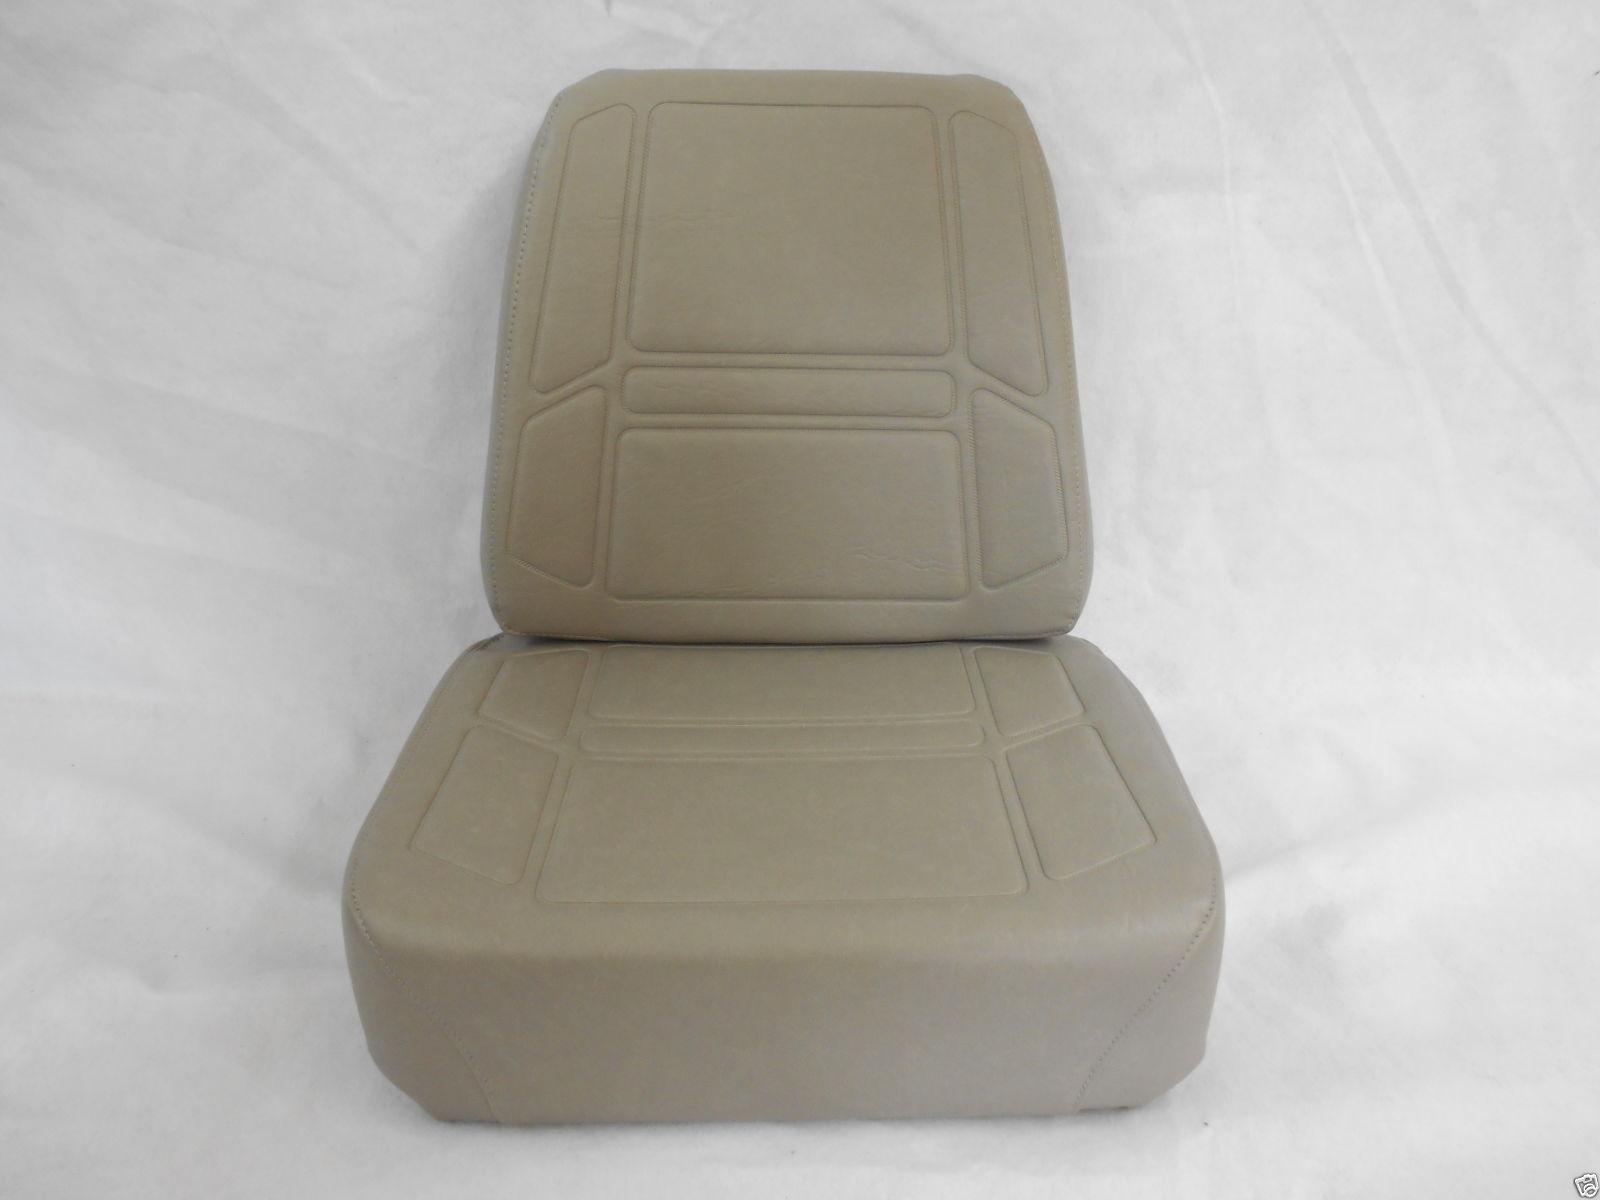 EXMARK TORO REPLACEMENT GRAY CUSHION SEAT SET EXTRA THICK BOTTOM CUSHION ZB Seat Warehouse